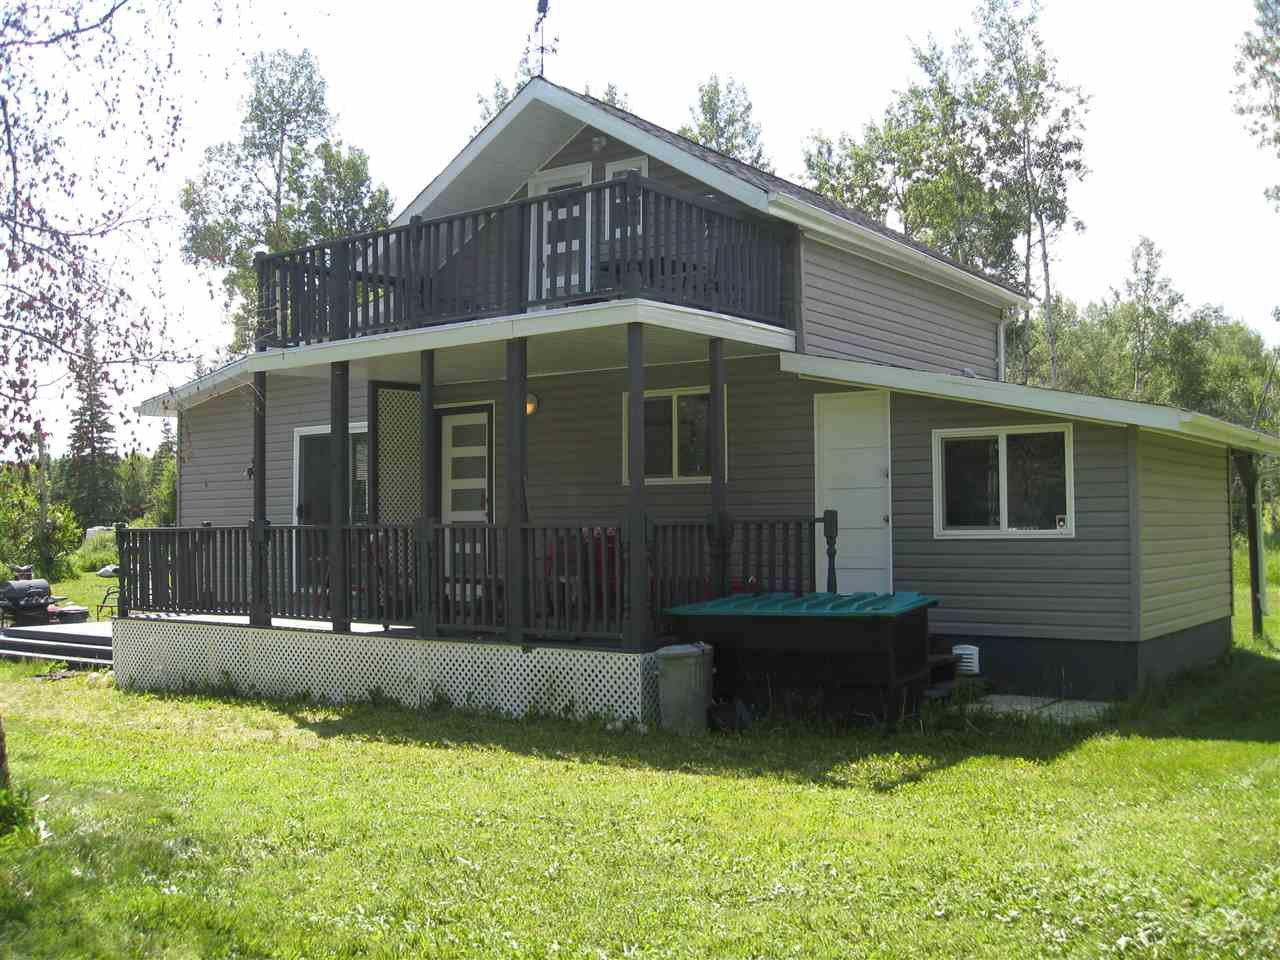 Main Photo: 3, 53513 Rge Rd 35: Rural Lac Ste. Anne County House for sale : MLS®# E4163540